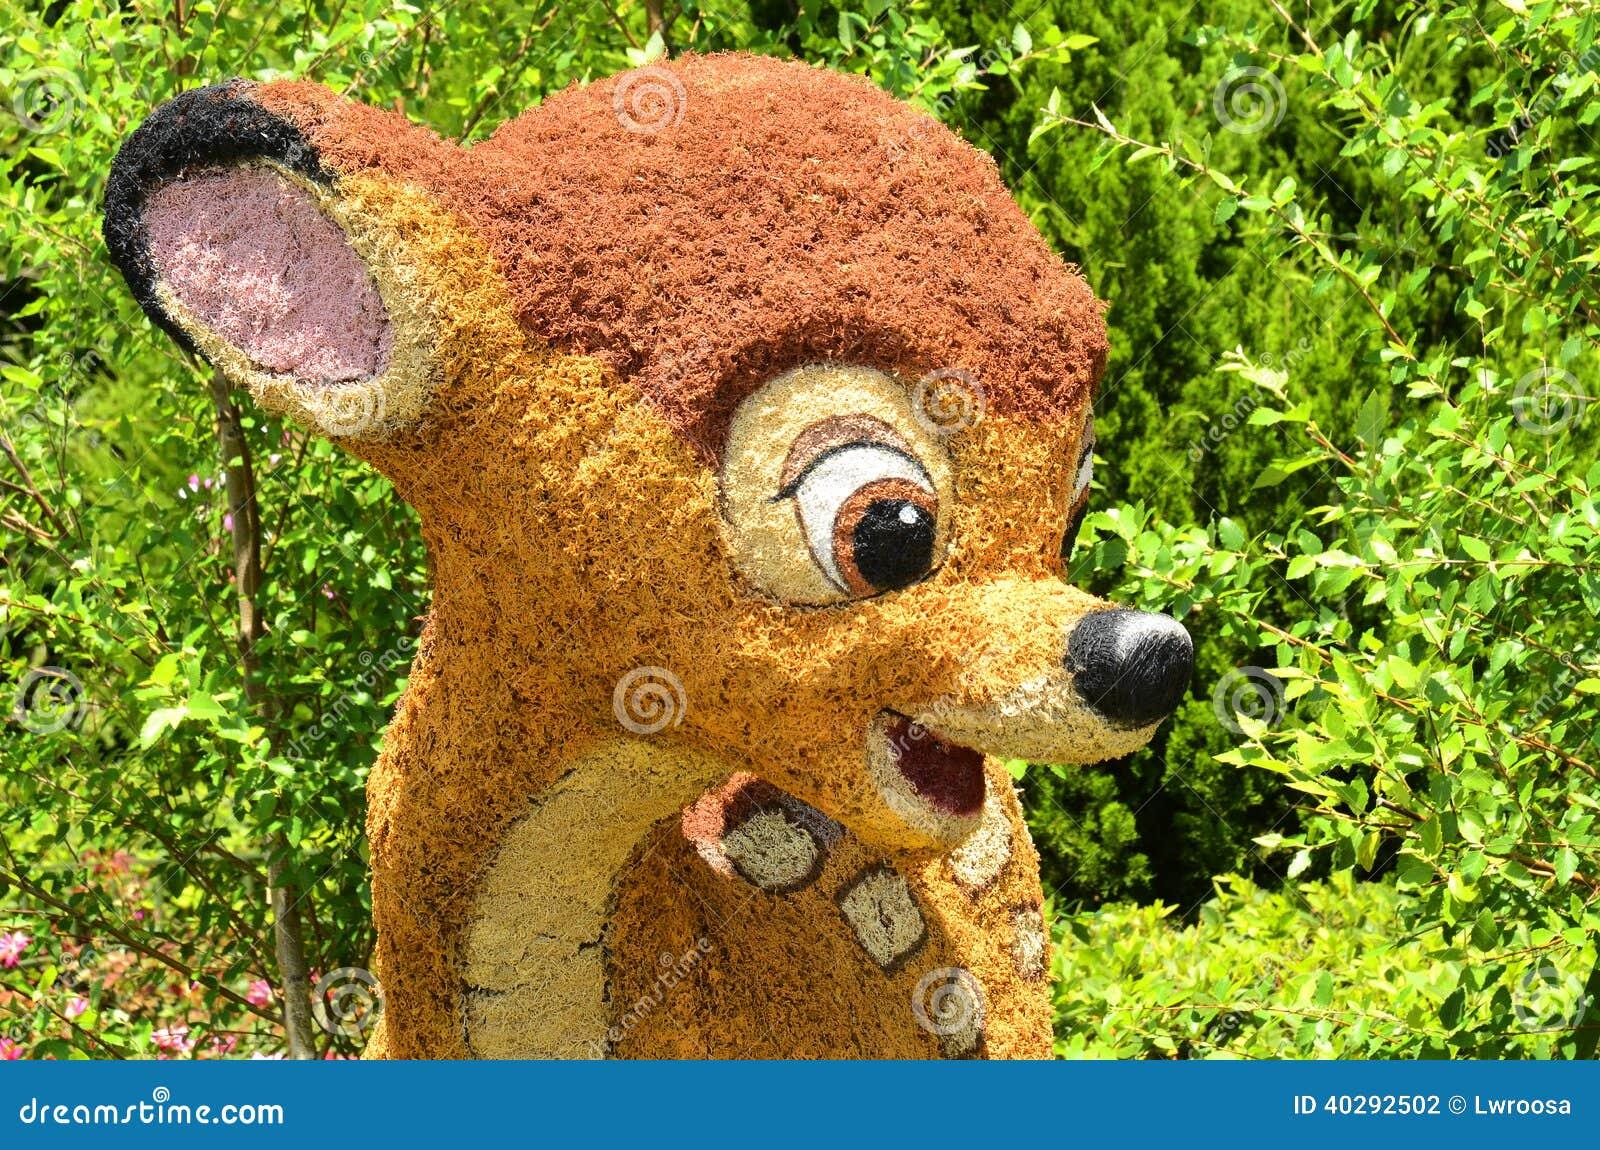 Disney Topiary Part - 20: Bambi Disney Festival Flower International Topiary ...